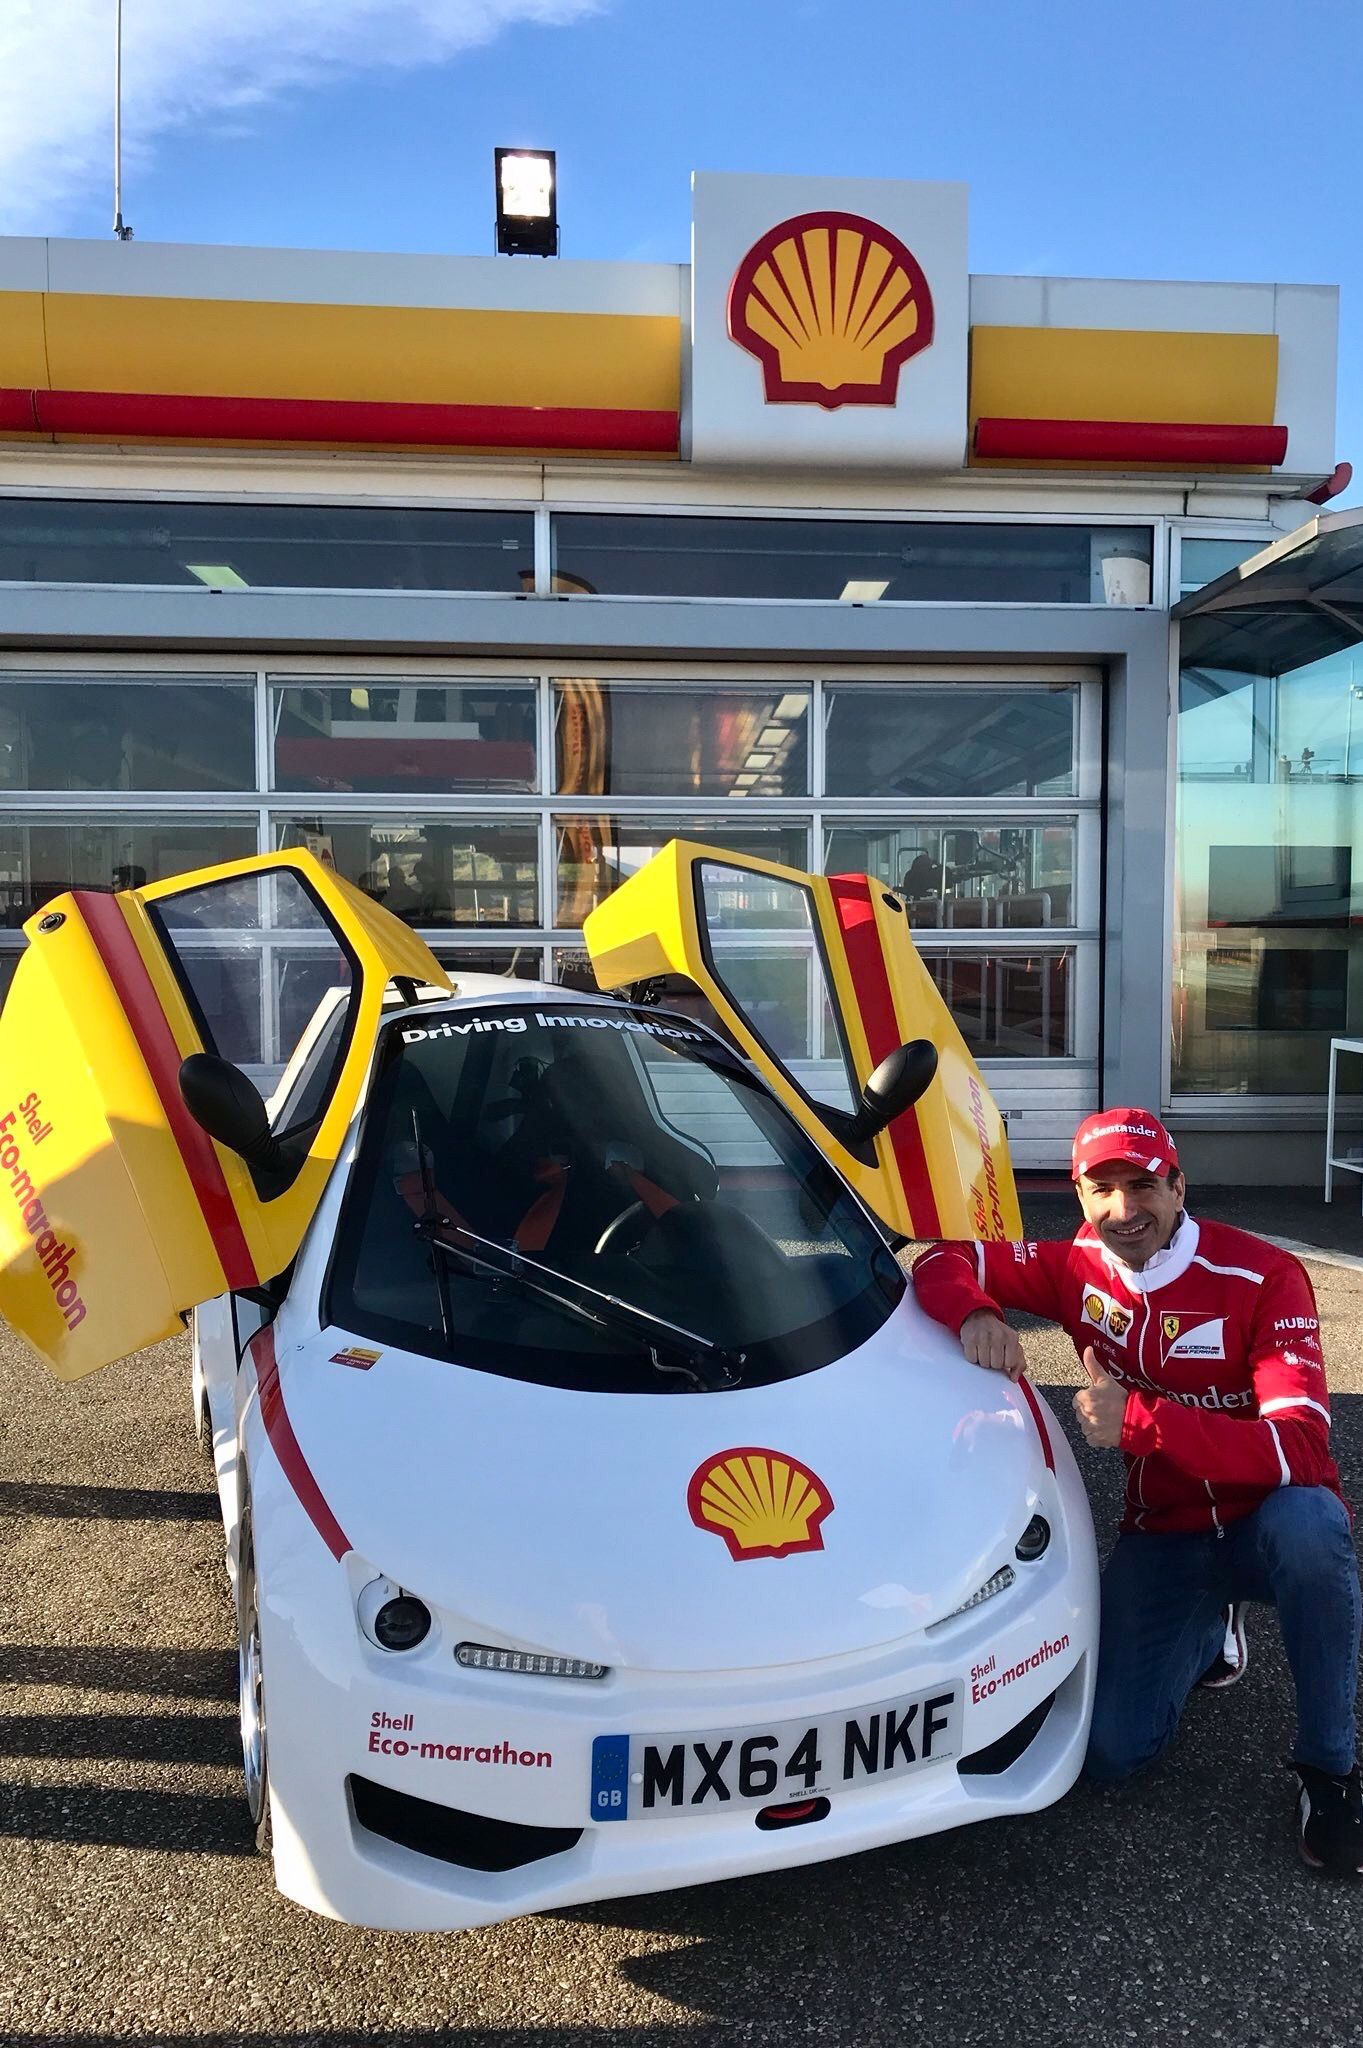 2017/12/5:Twitter: @marc_gene : At #Fiorano today #DriversWorldChsmpionship #shellecomarathon This car has only 100ml fuel tank!! @ShellMotorsport.